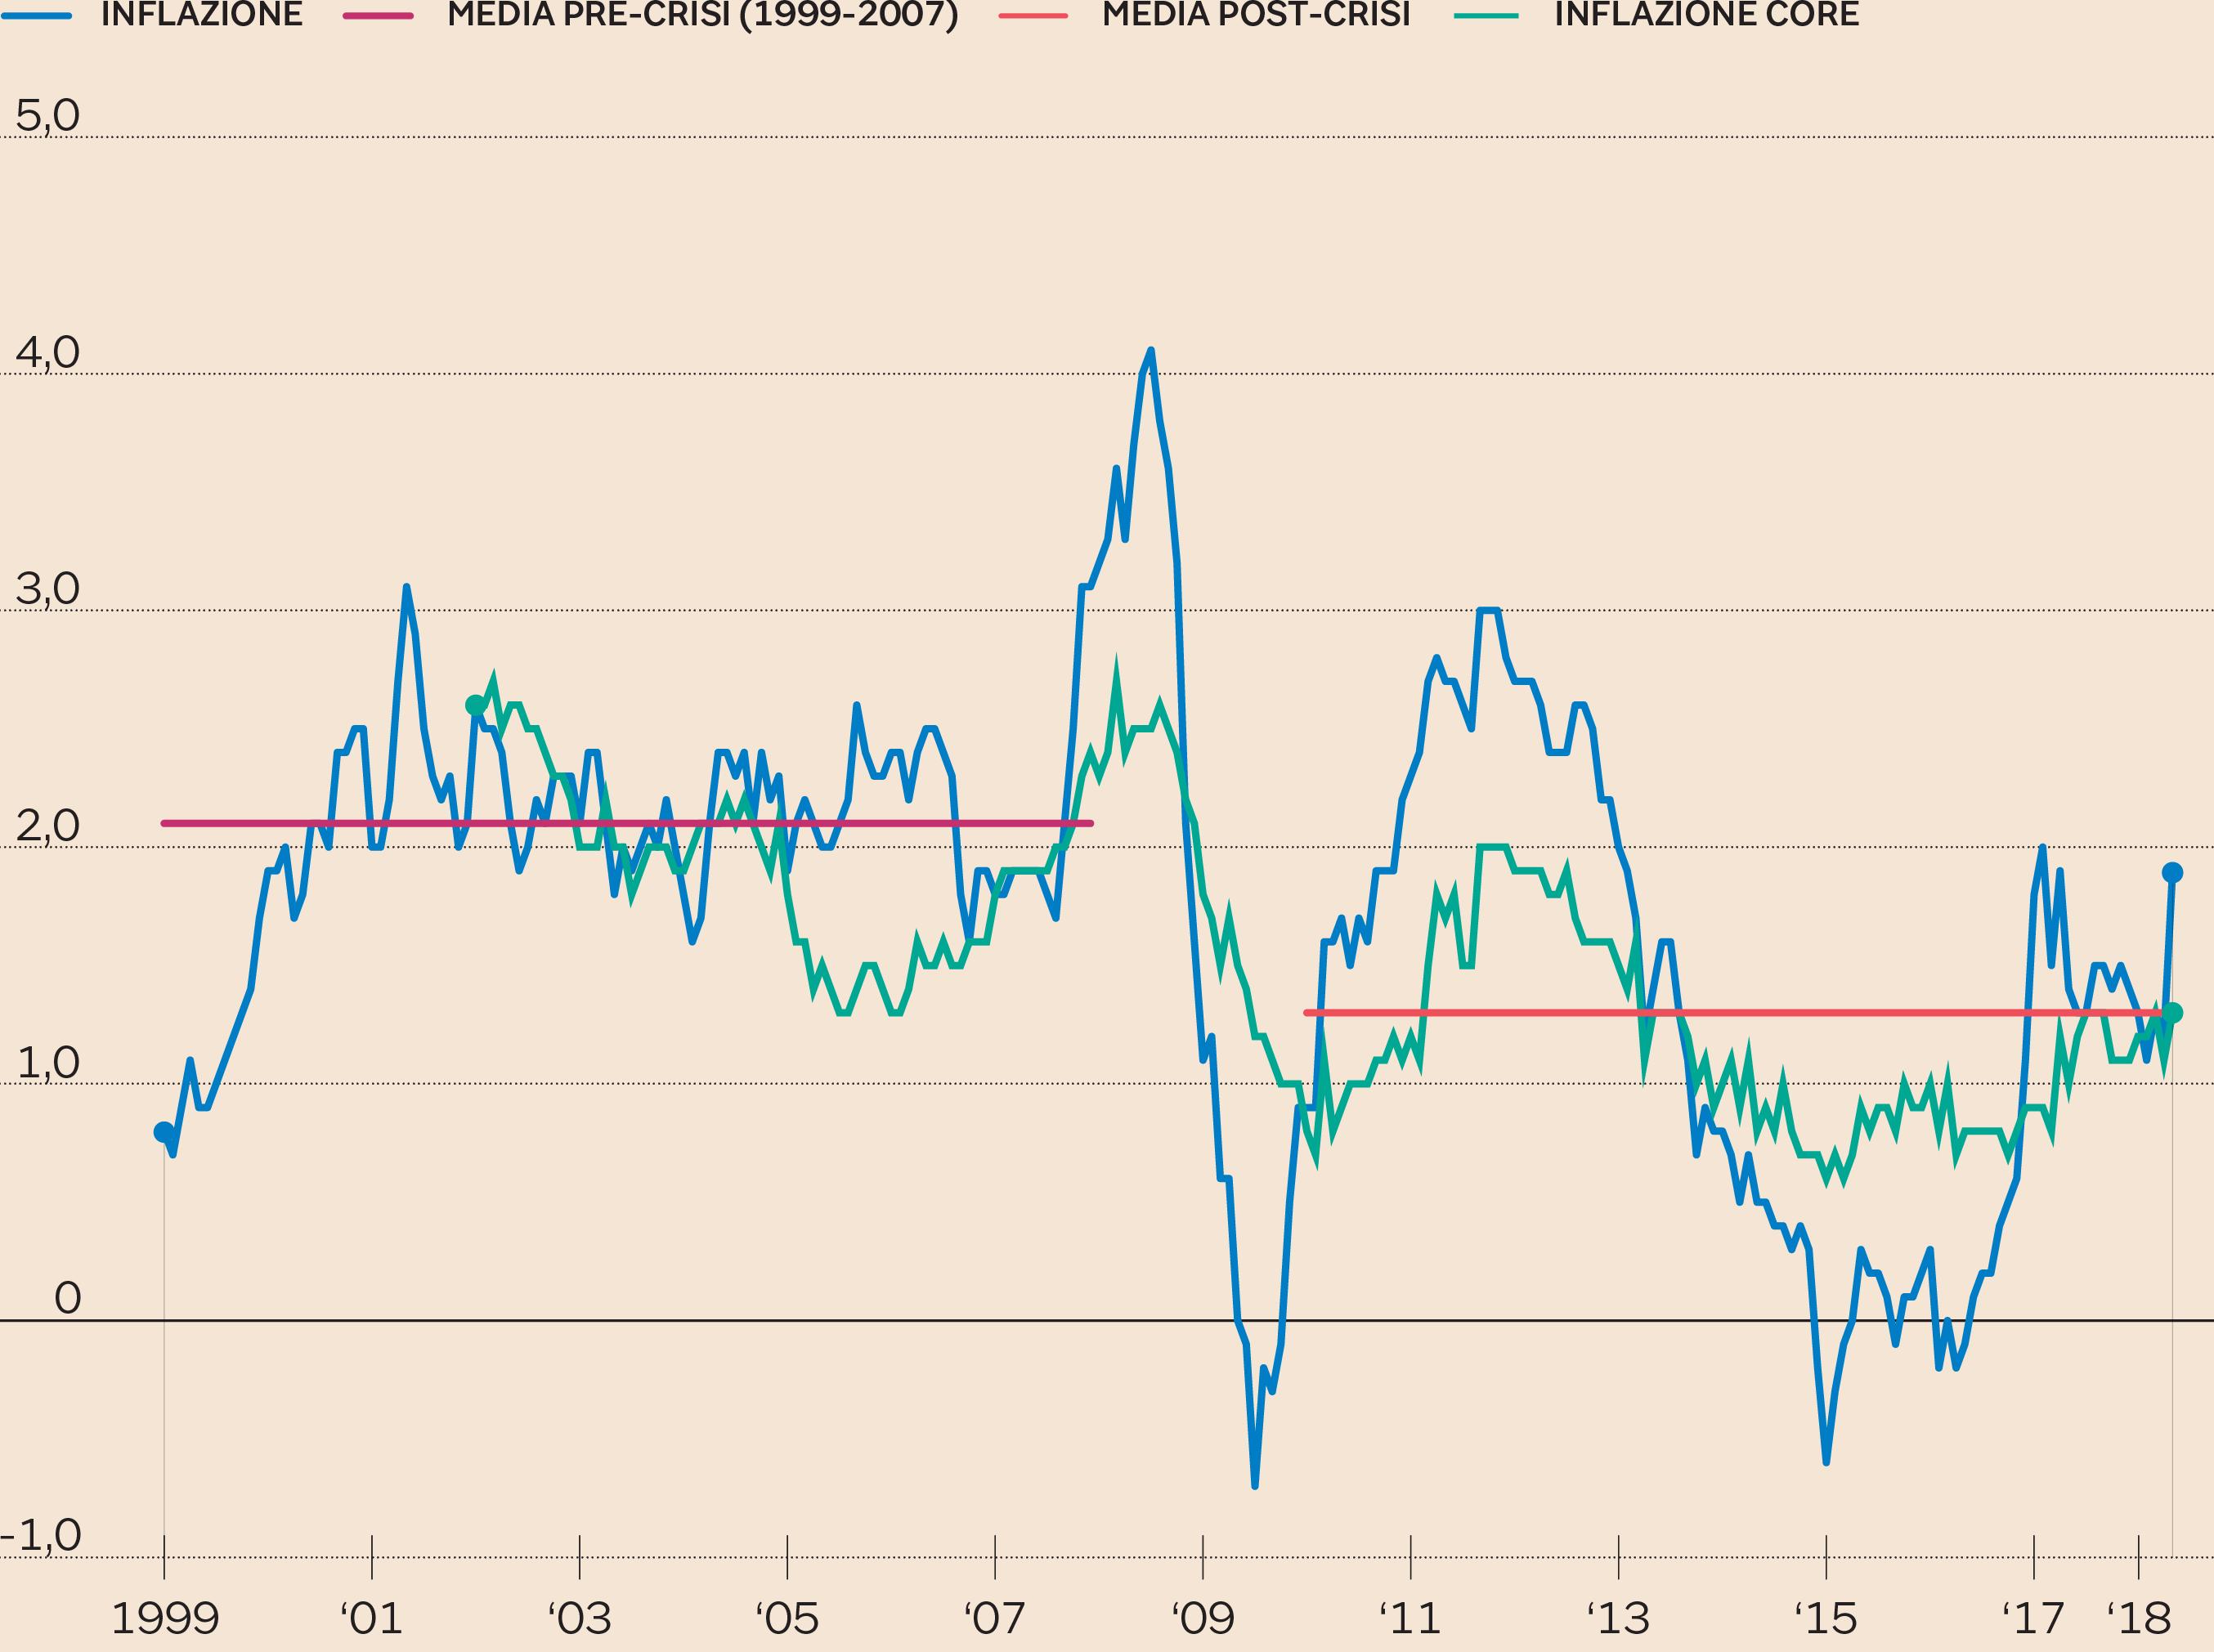 La Bce riduce il Quantitative easing a 15 miliardi al mese